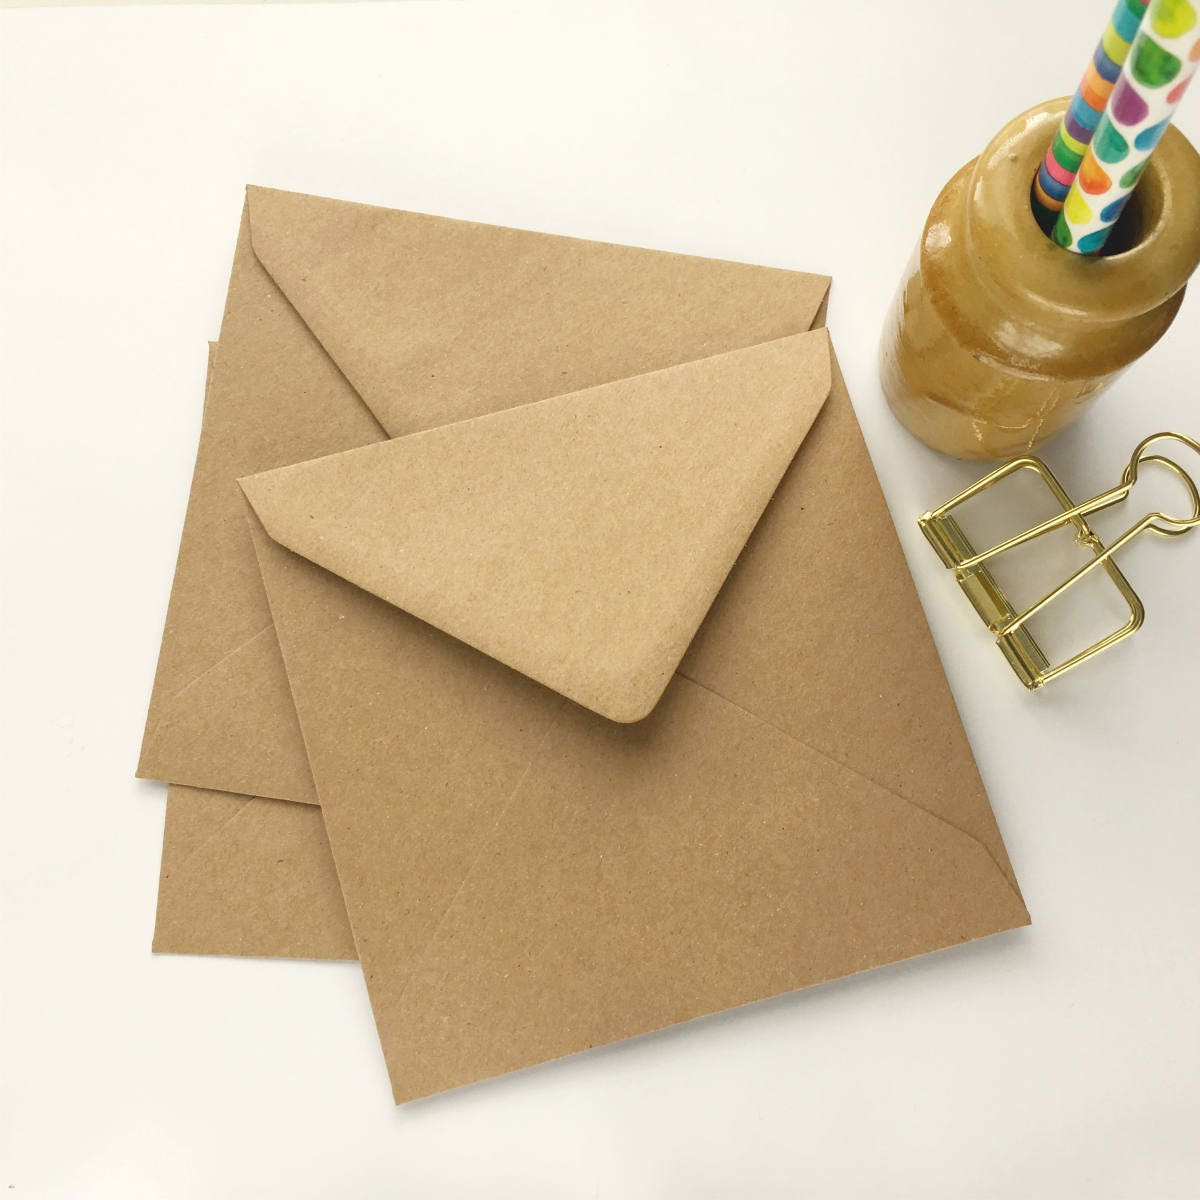 50 kraft envelopes 5 envelopes square envelopes recycled zoom kristyandbryce Choice Image